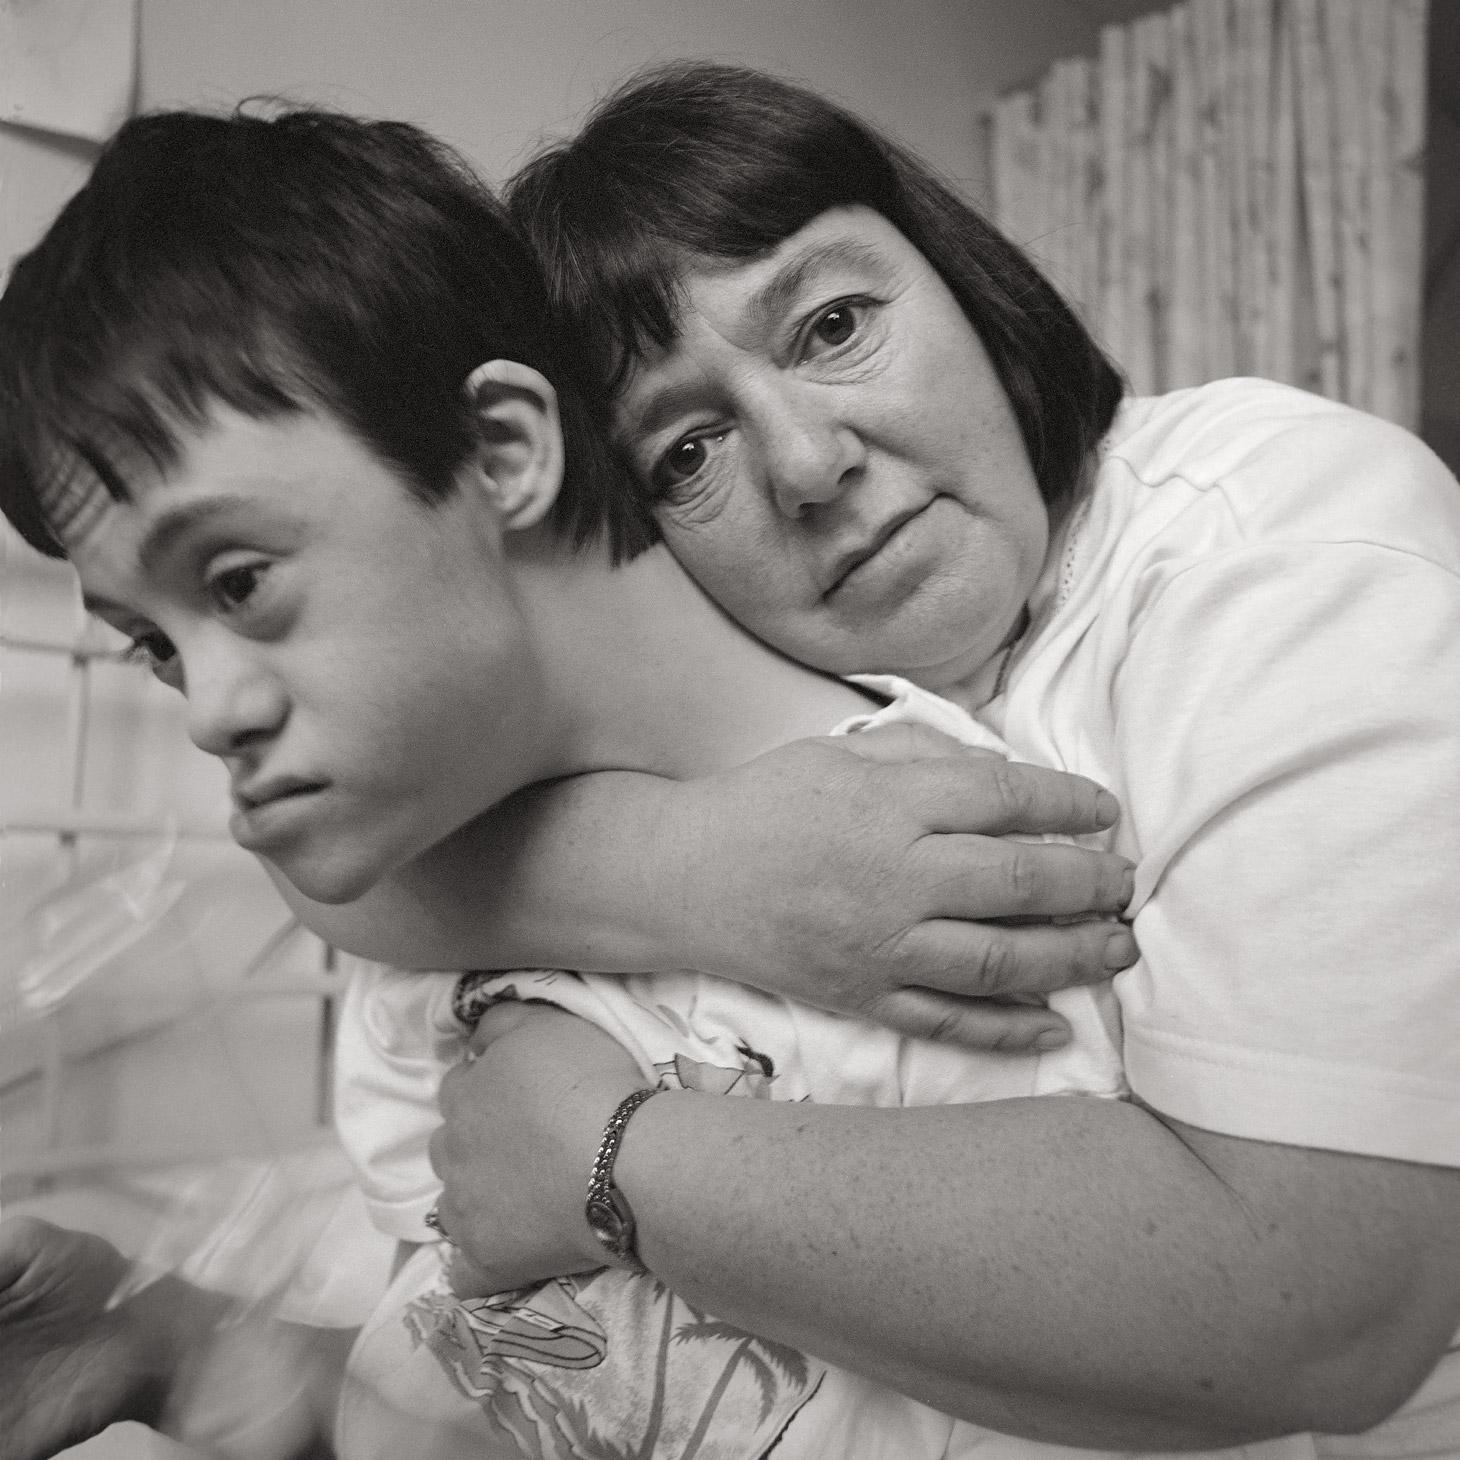 Sheffield Children's Hospital - Bill Stephenson